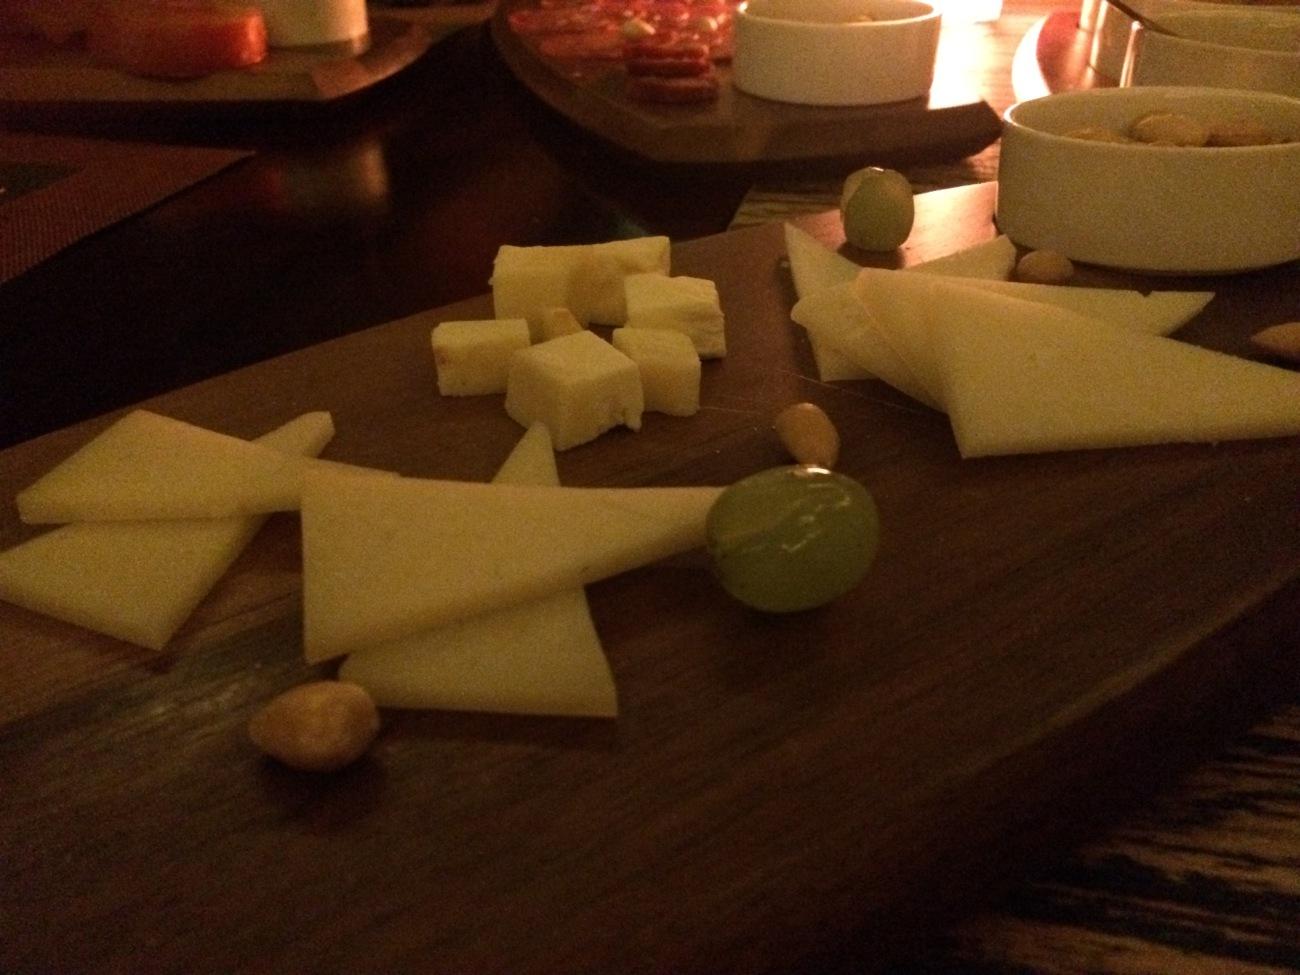 Trio of Spanish cheeses